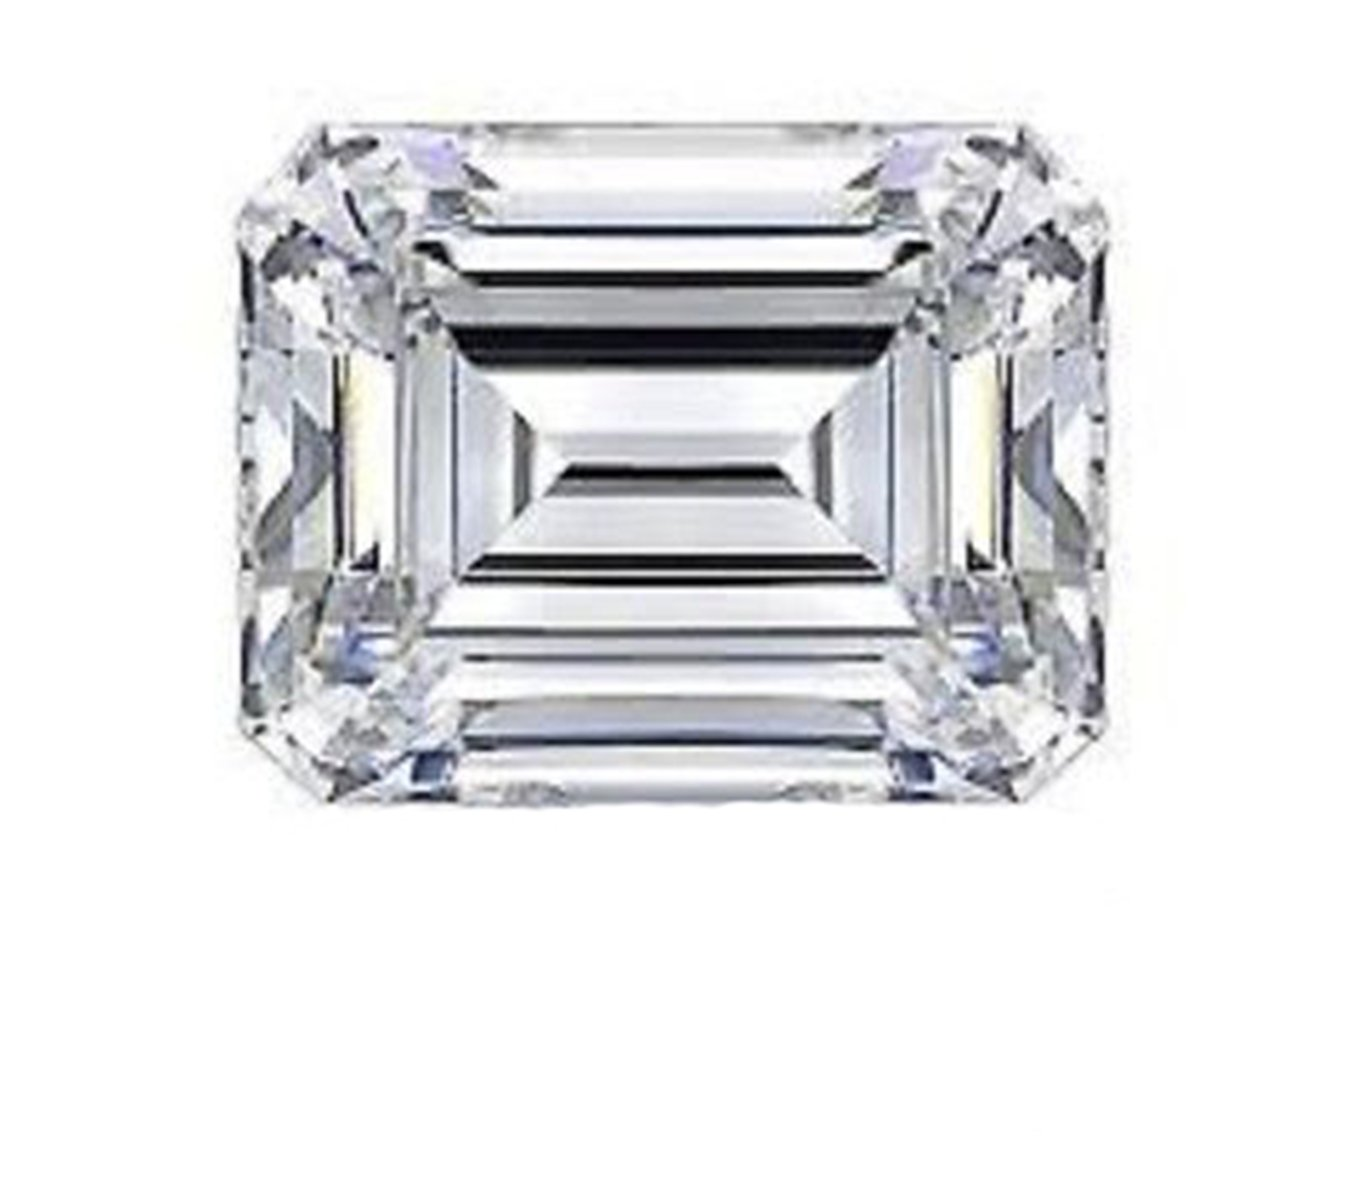 RINGJEWEL 2.32 ct VVS1 Emerald Cut Real Loose Moissanite Use 4 Pendant/Ring Genuine White H-I Color